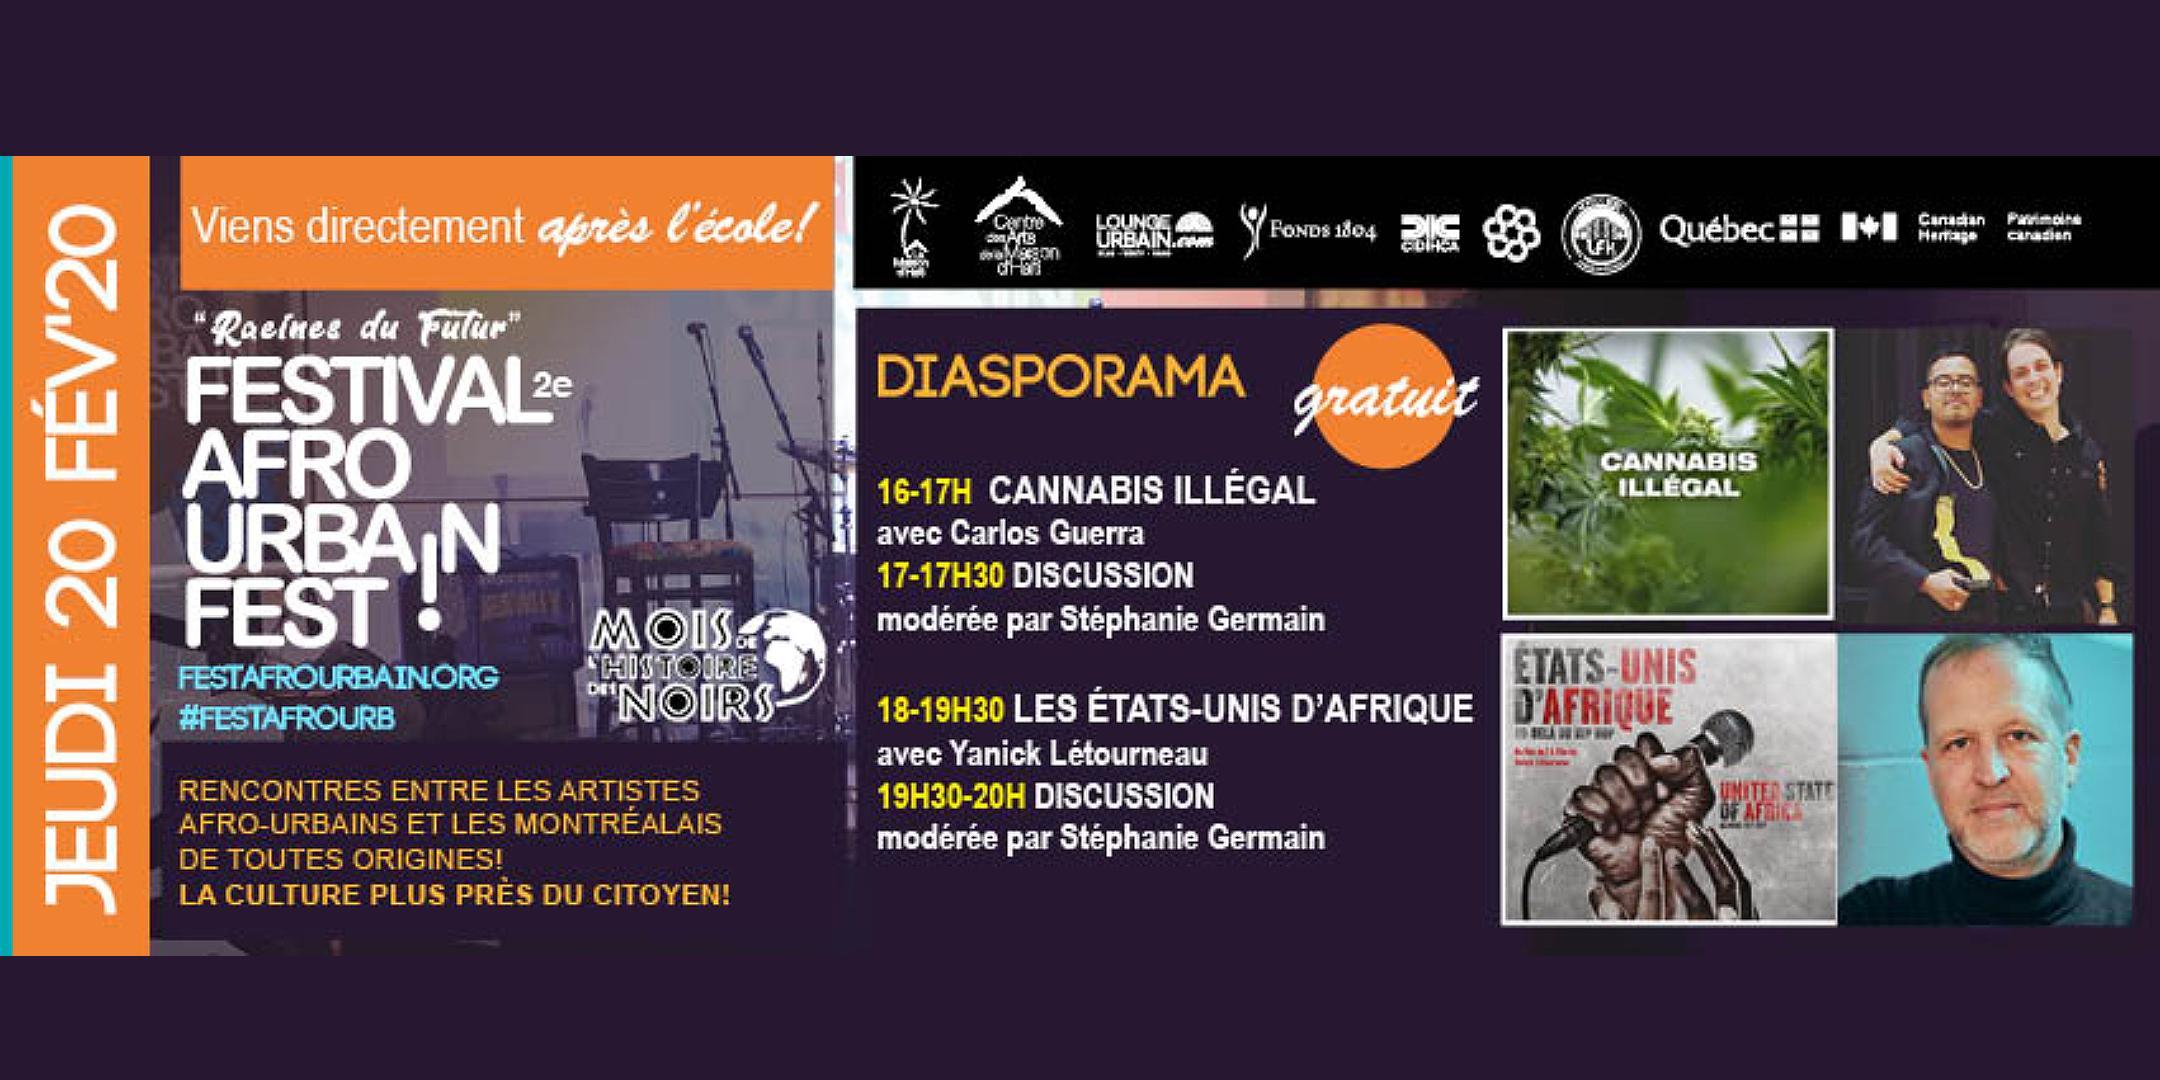 Journée film Diasporama : Festival Afro Urbain